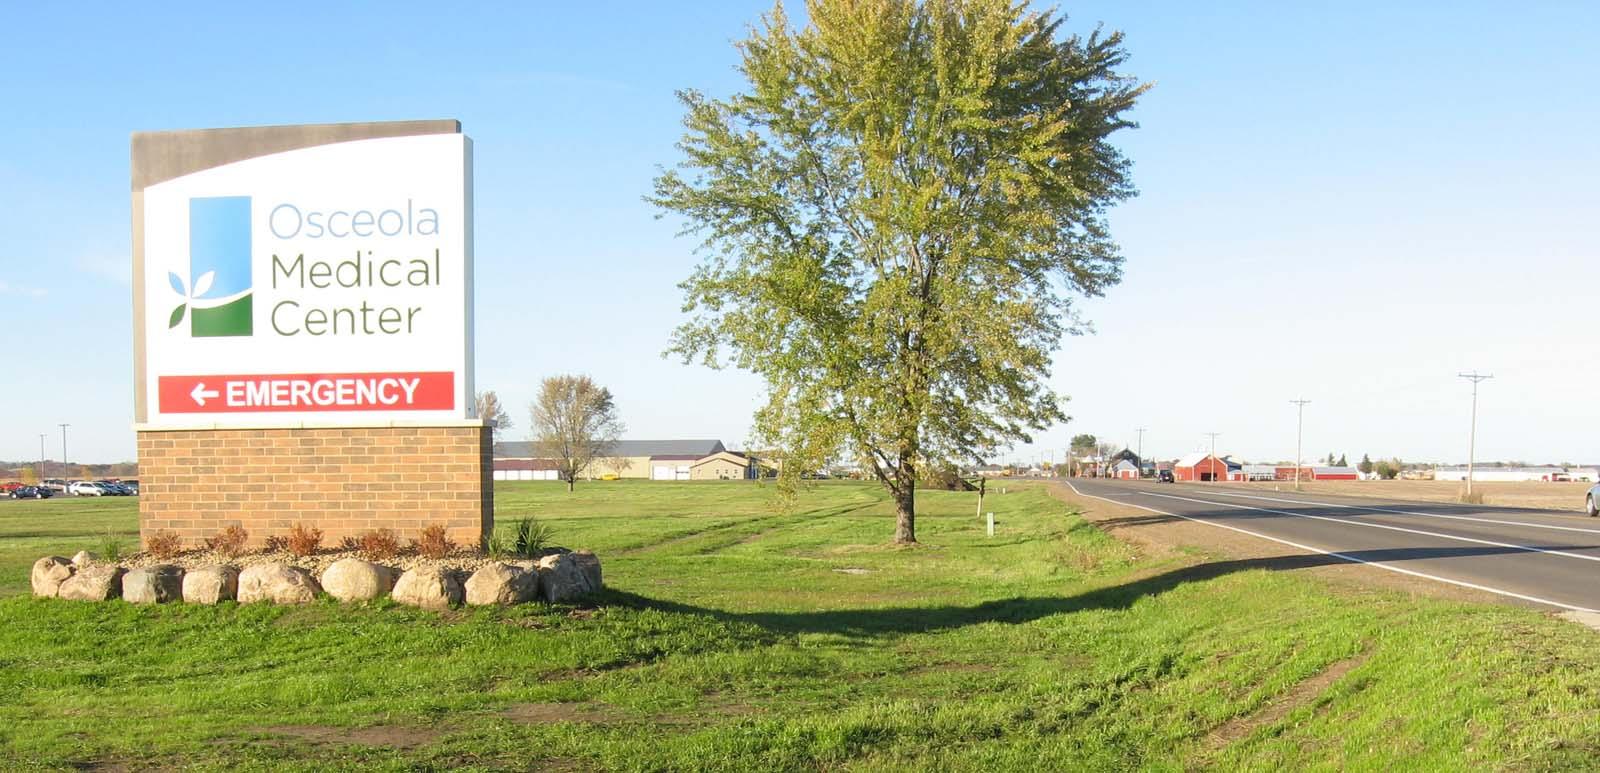 Osceola Hospital Utility Extension Project photo 1